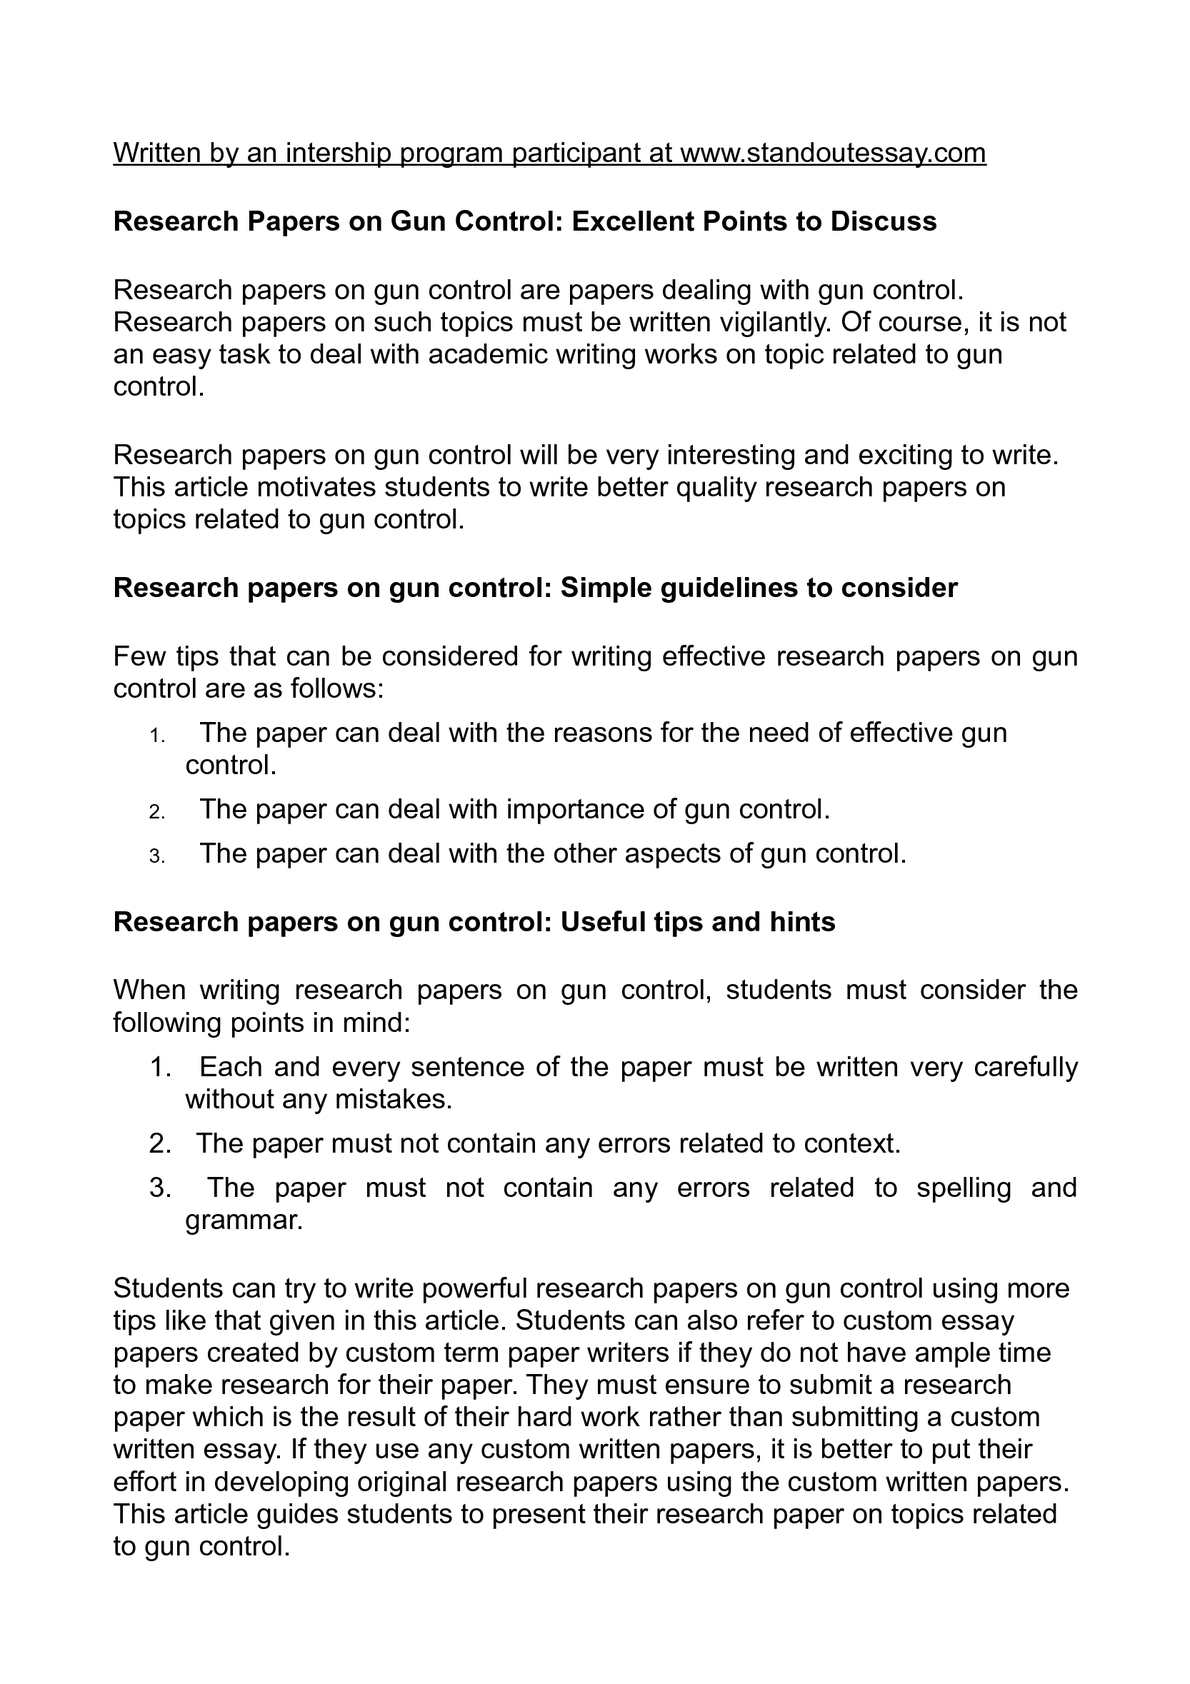 gun control research paper questions